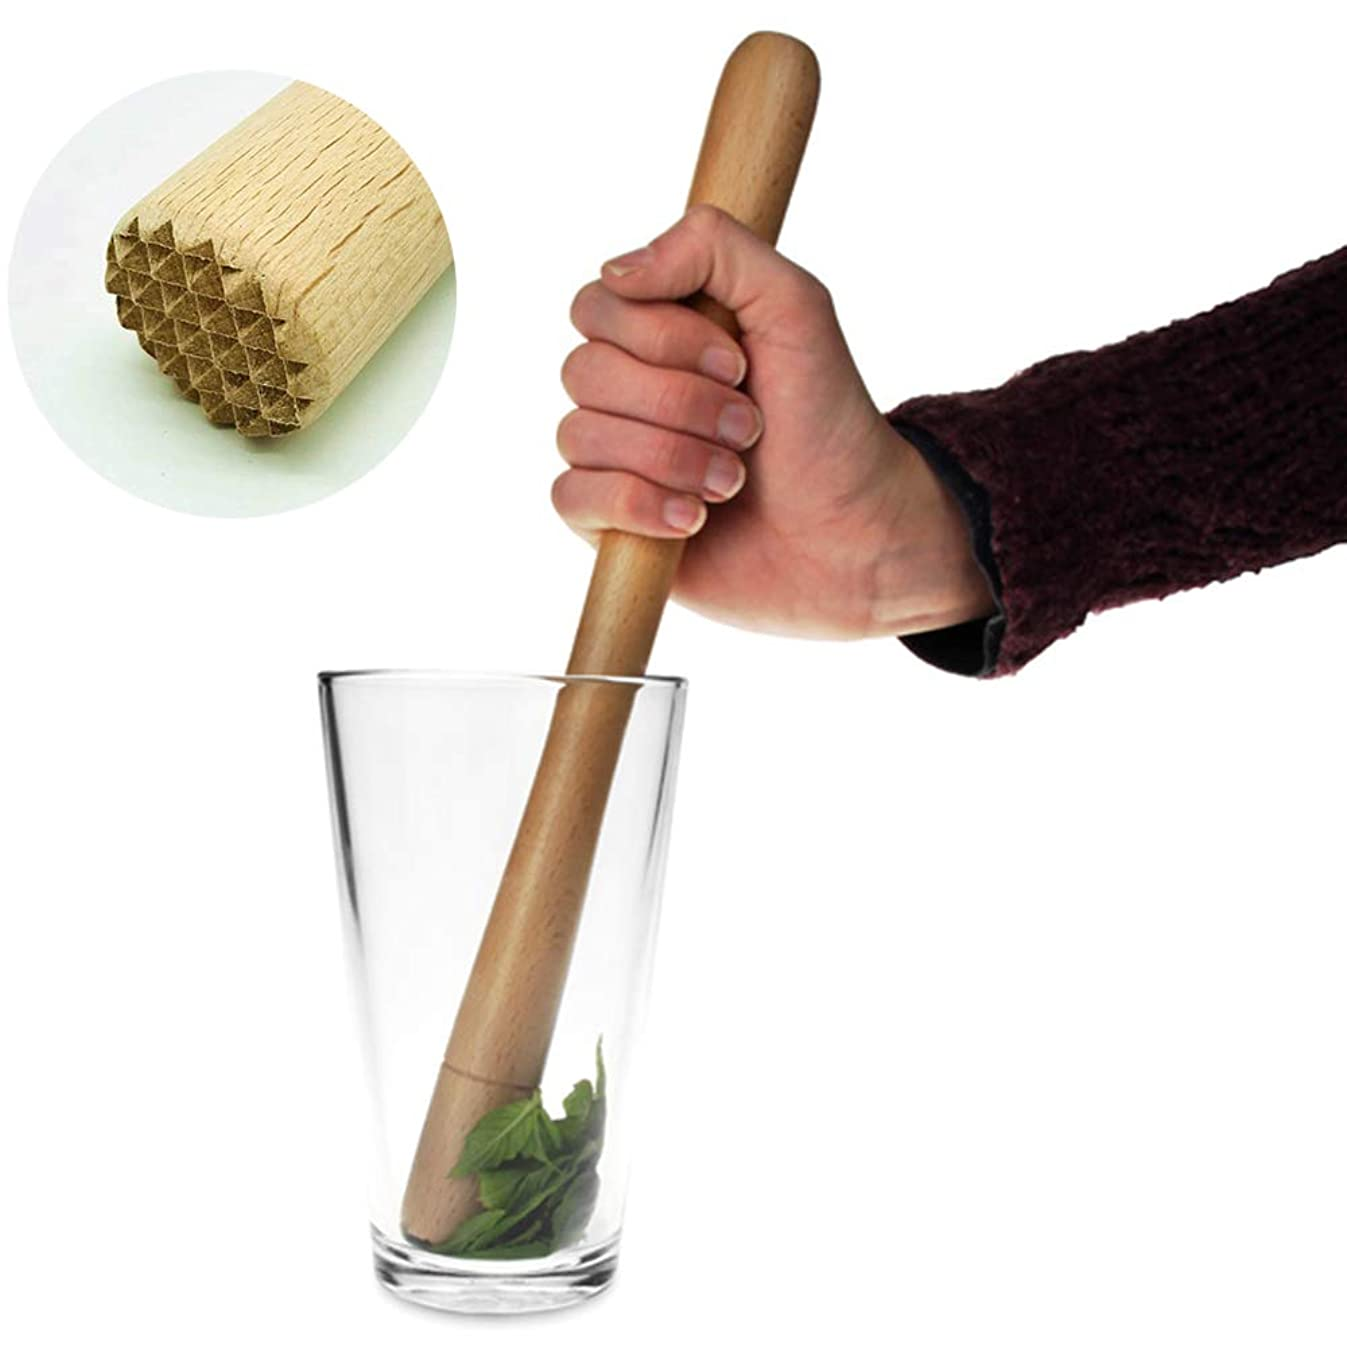 Wooden Mojito Muddler - Durable Cocktail Muddler 12in/300mm, Stable Muddled Fruit Mint Lime Lemon Herb - ML08